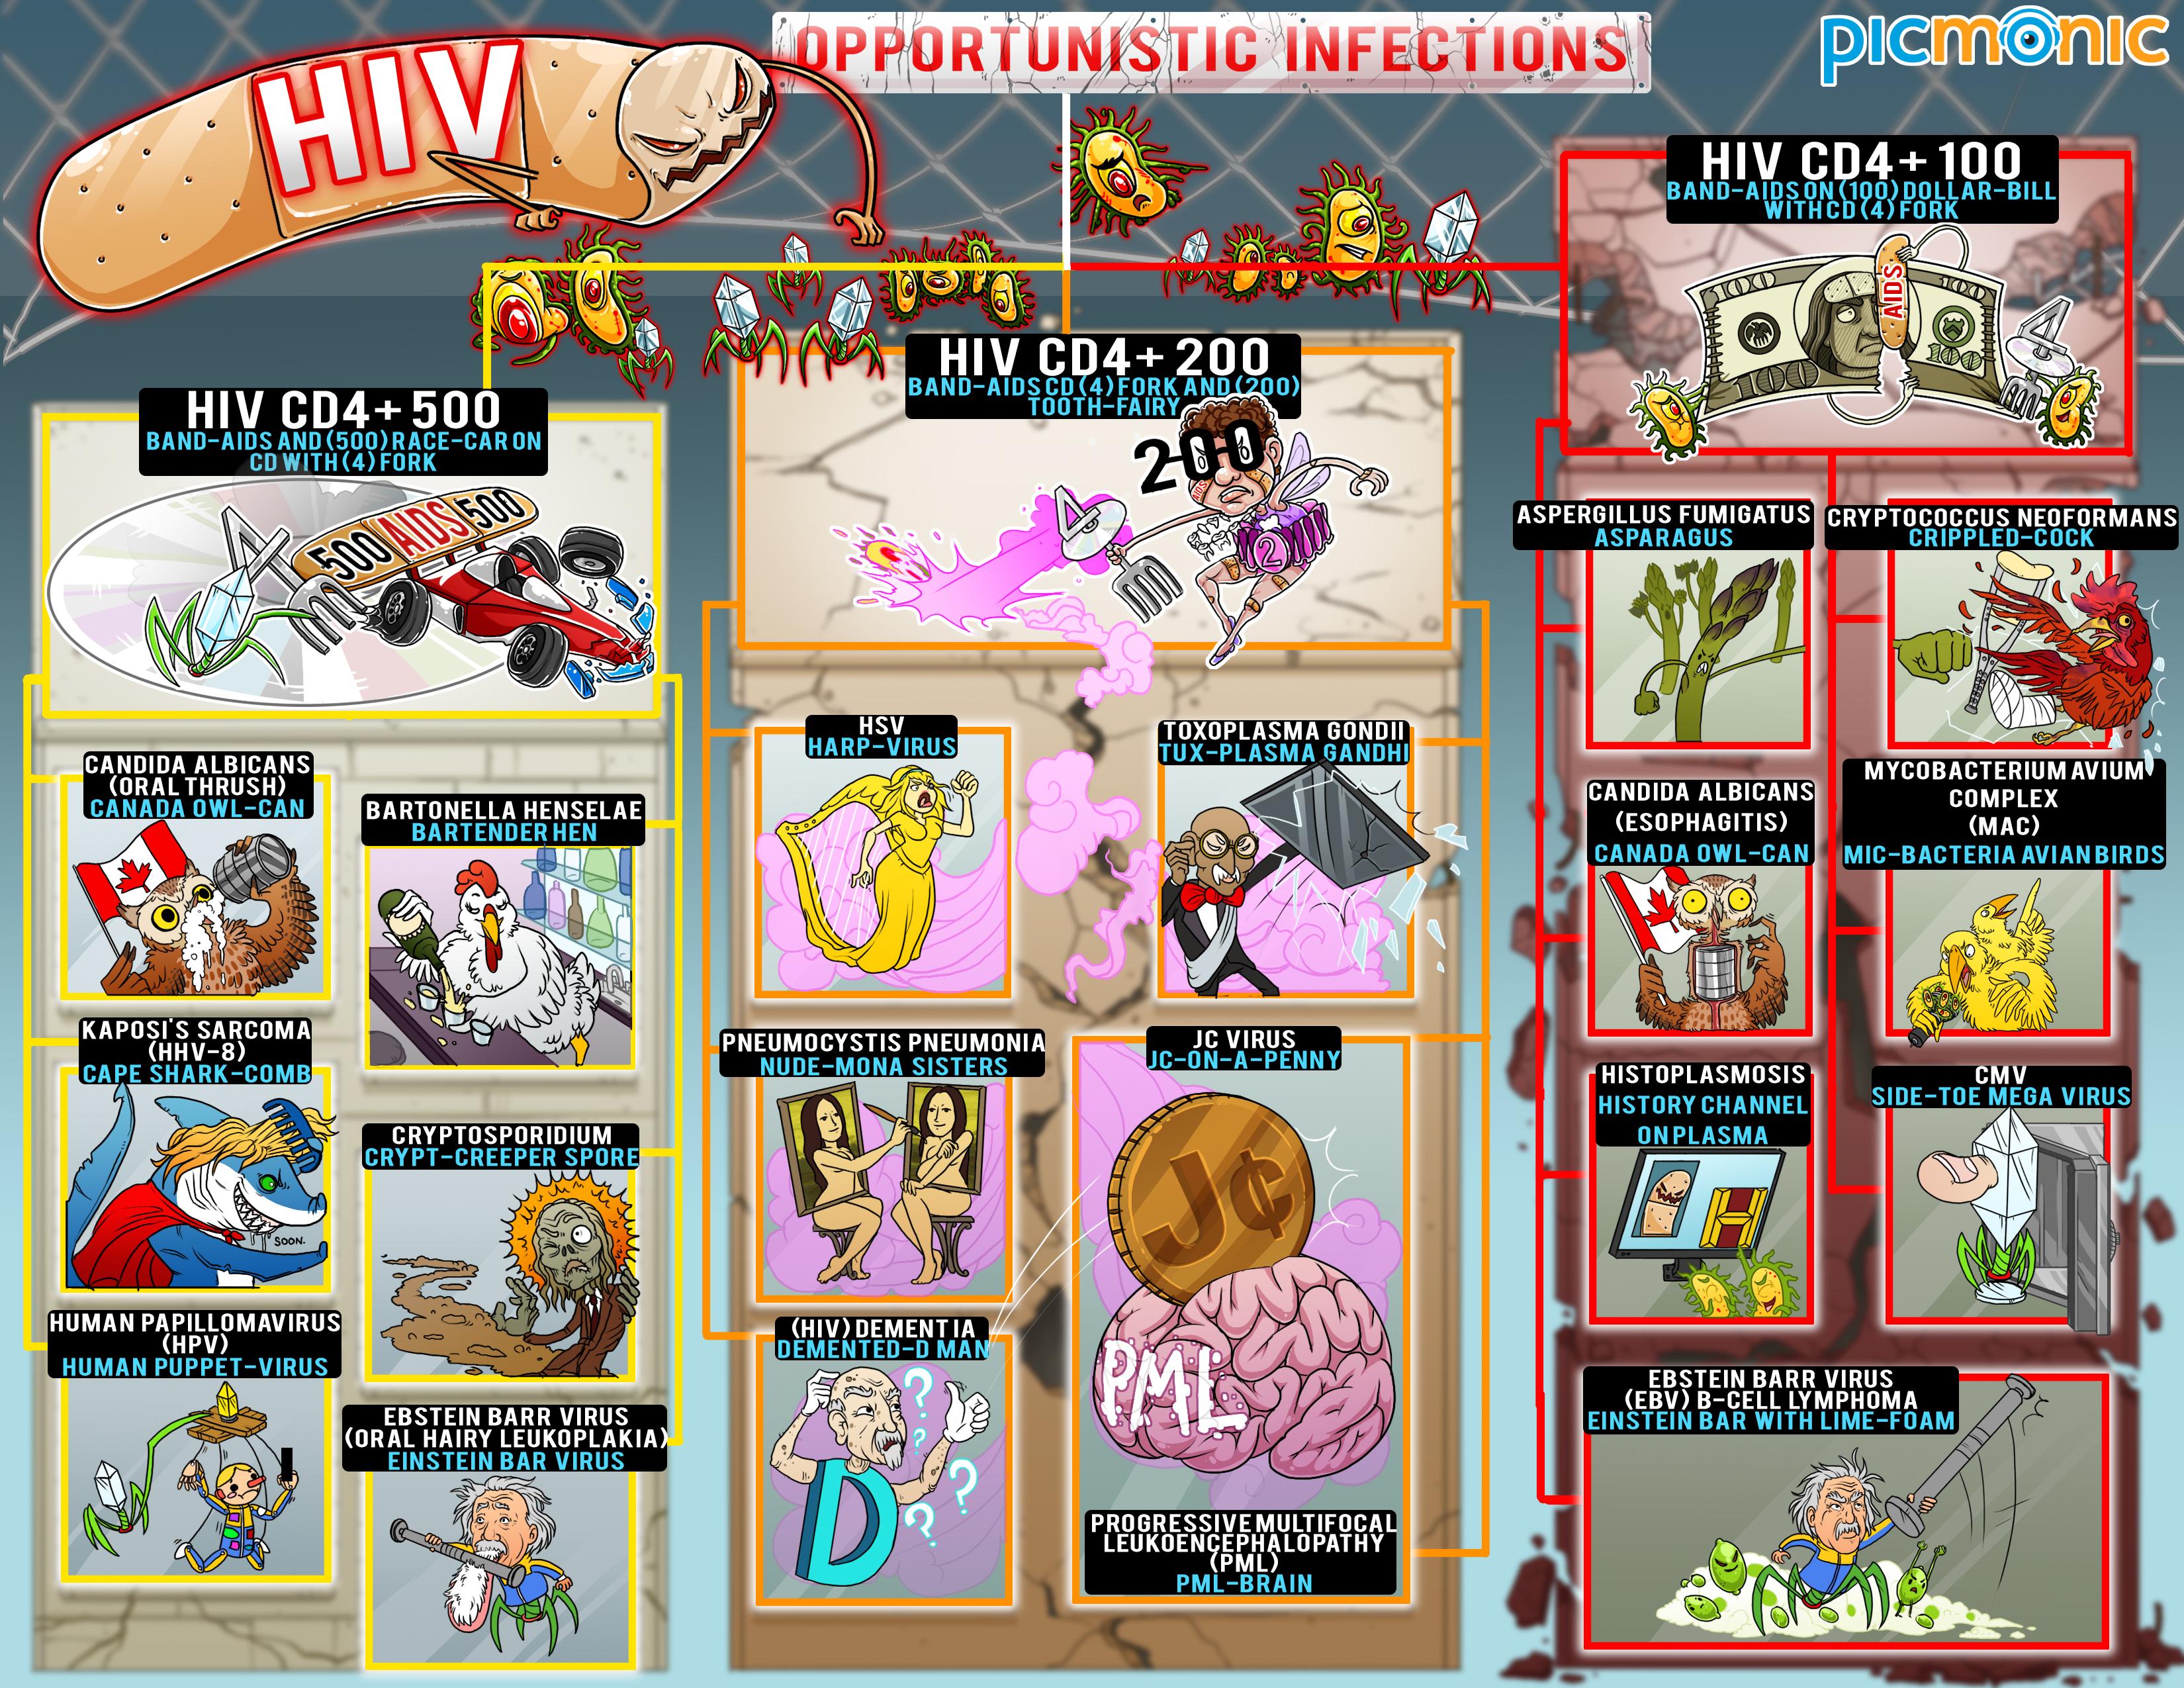 IM_INFO_HIVOpportunisticInfectionsL_V1.4